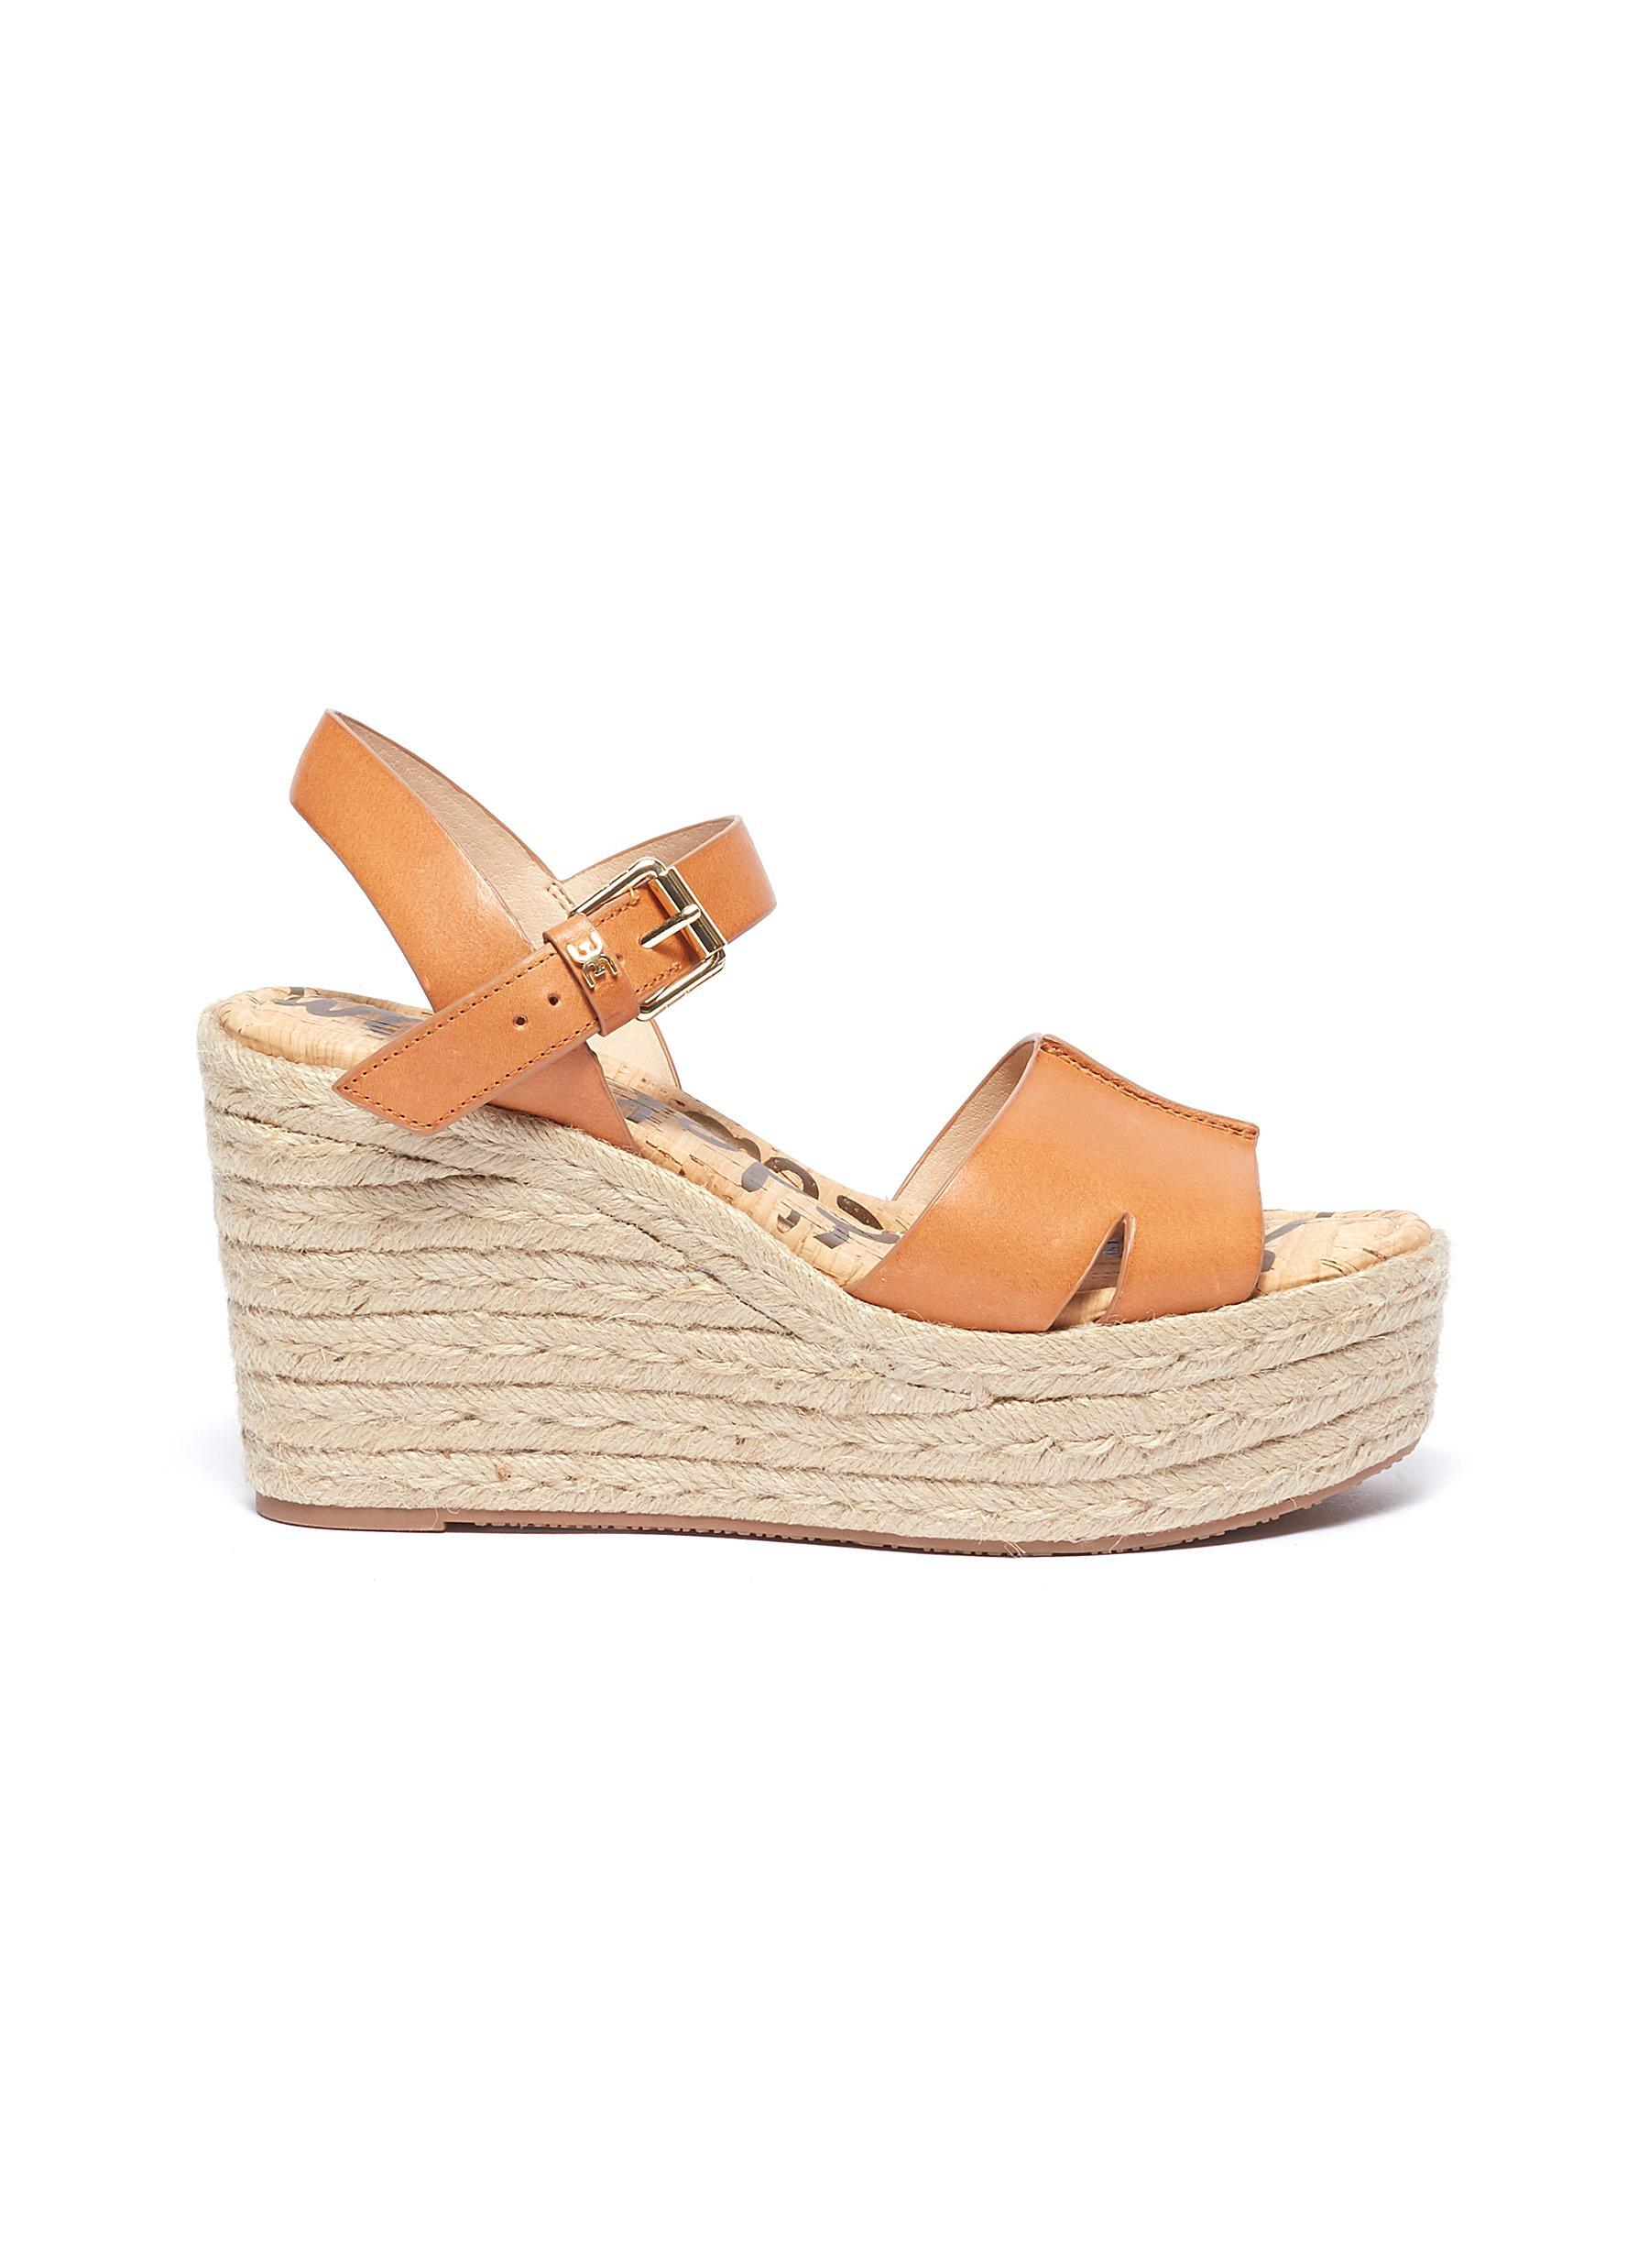 1eaca7257 Sam Edelman  maura  Leather Espadrille Wedge Sandals for Men - Lyst